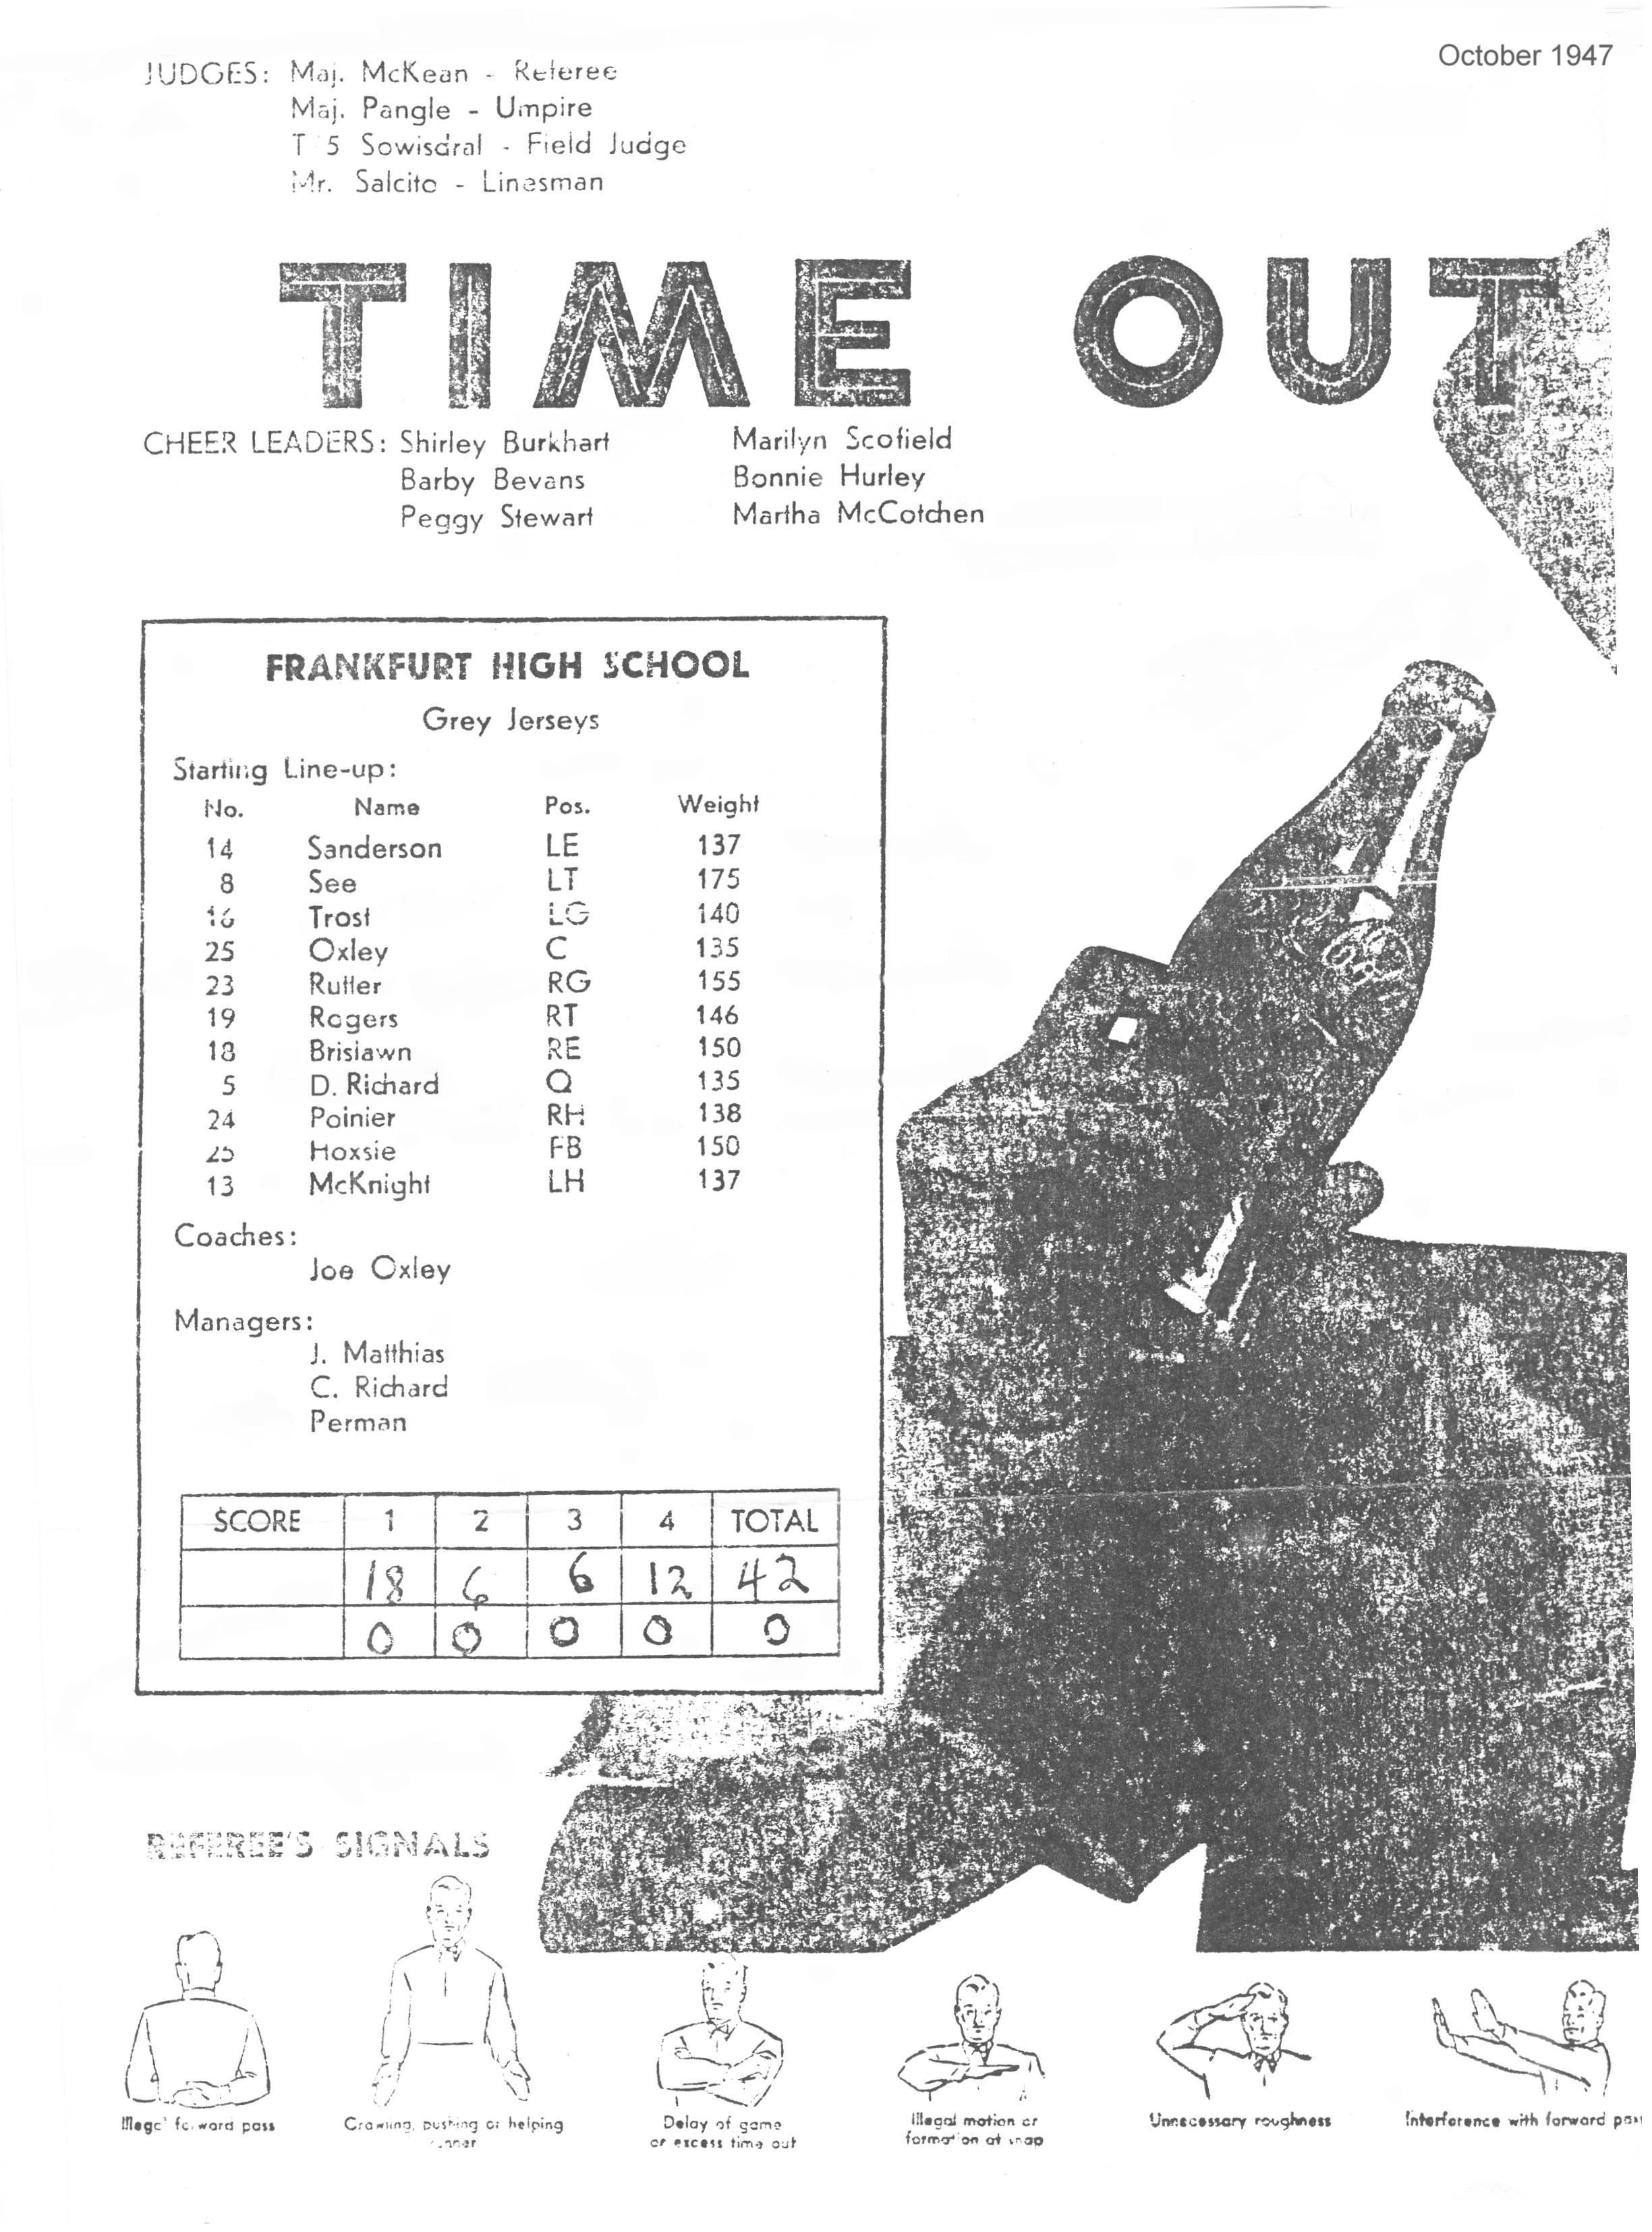 FAHS Dackel Years 1946-1955